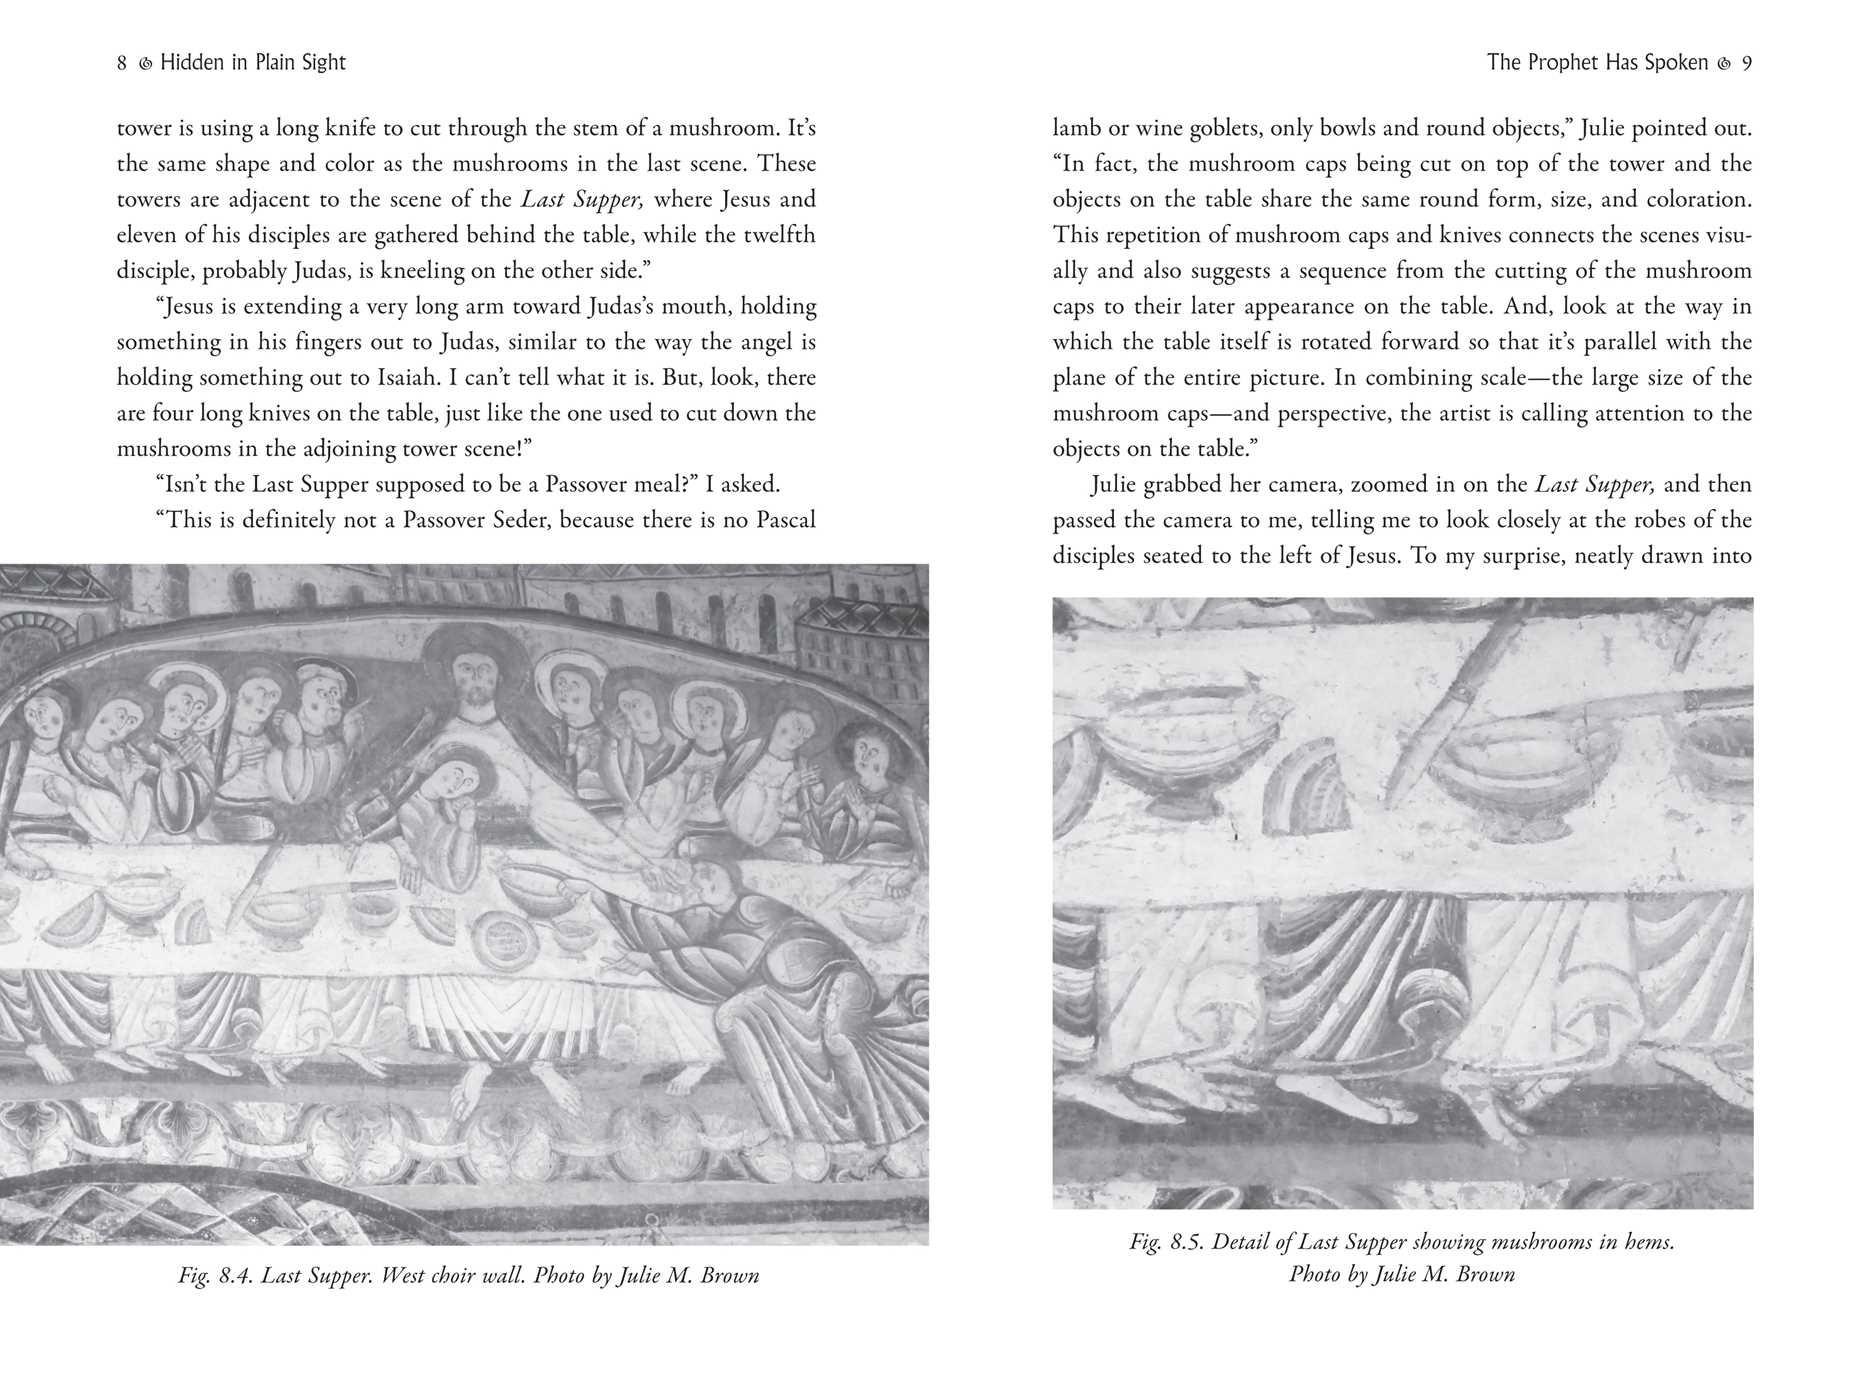 The psychedelic gospels 9781620555026.in03